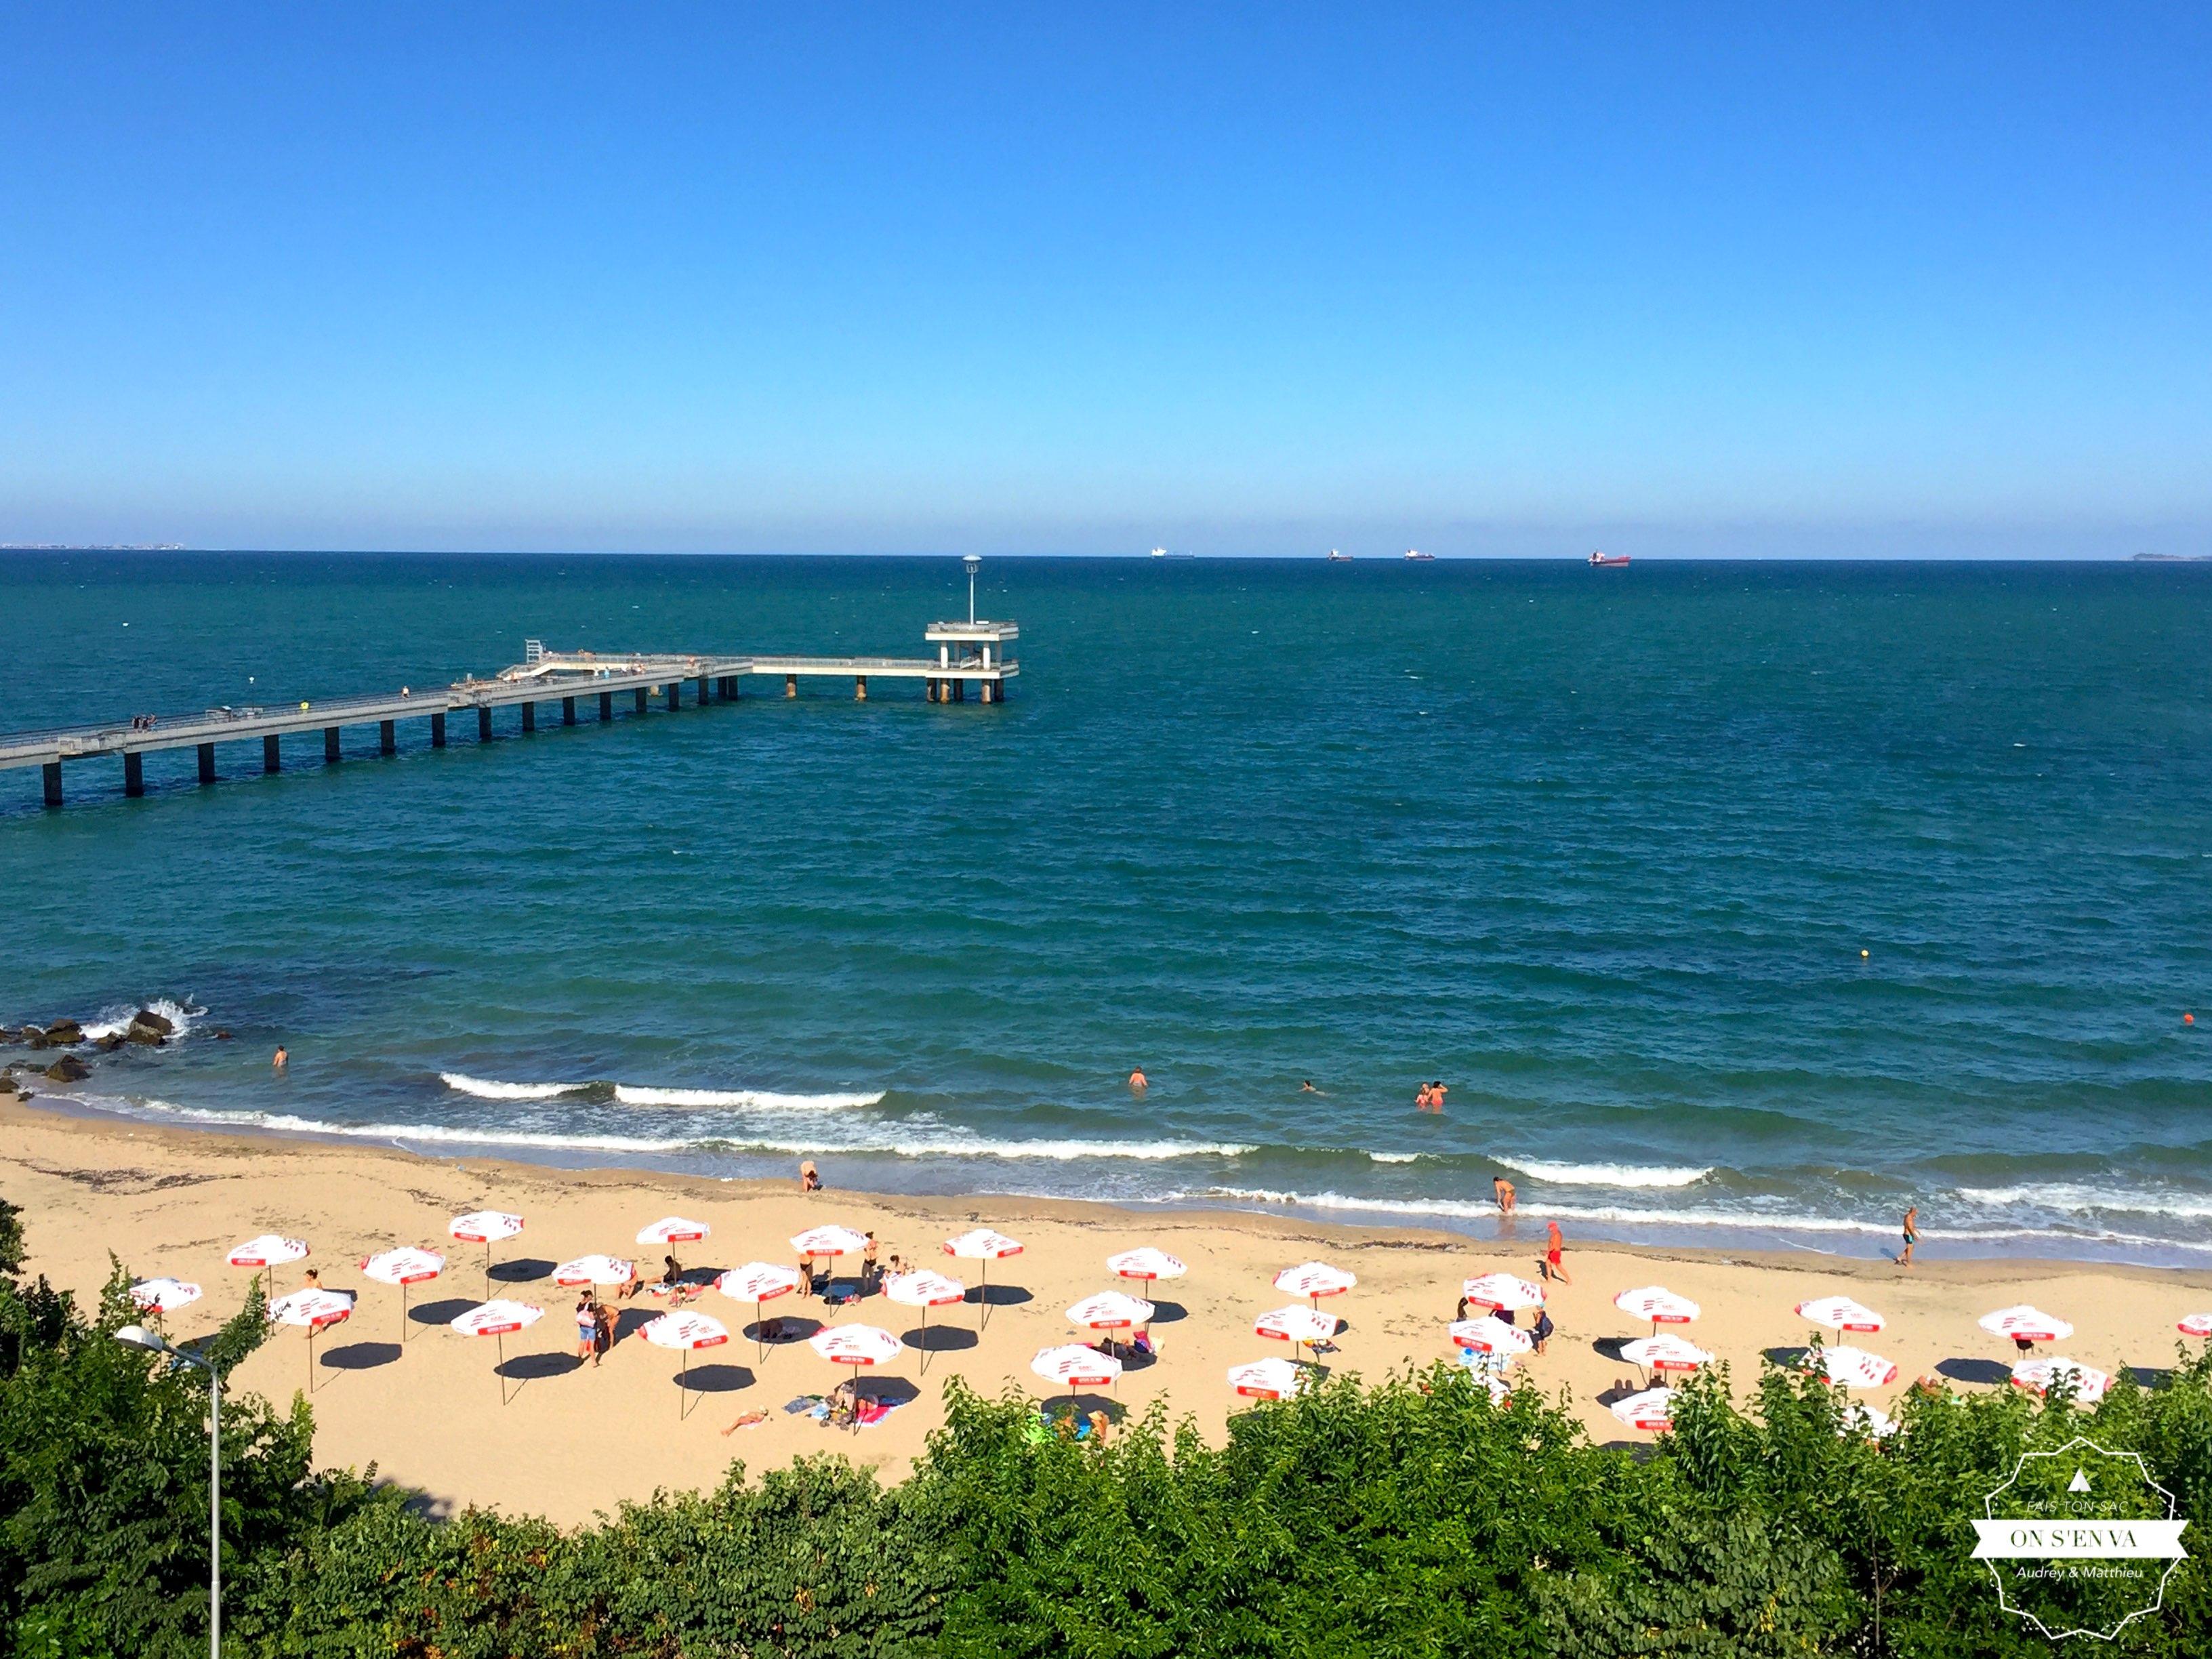 La plage de Burgas